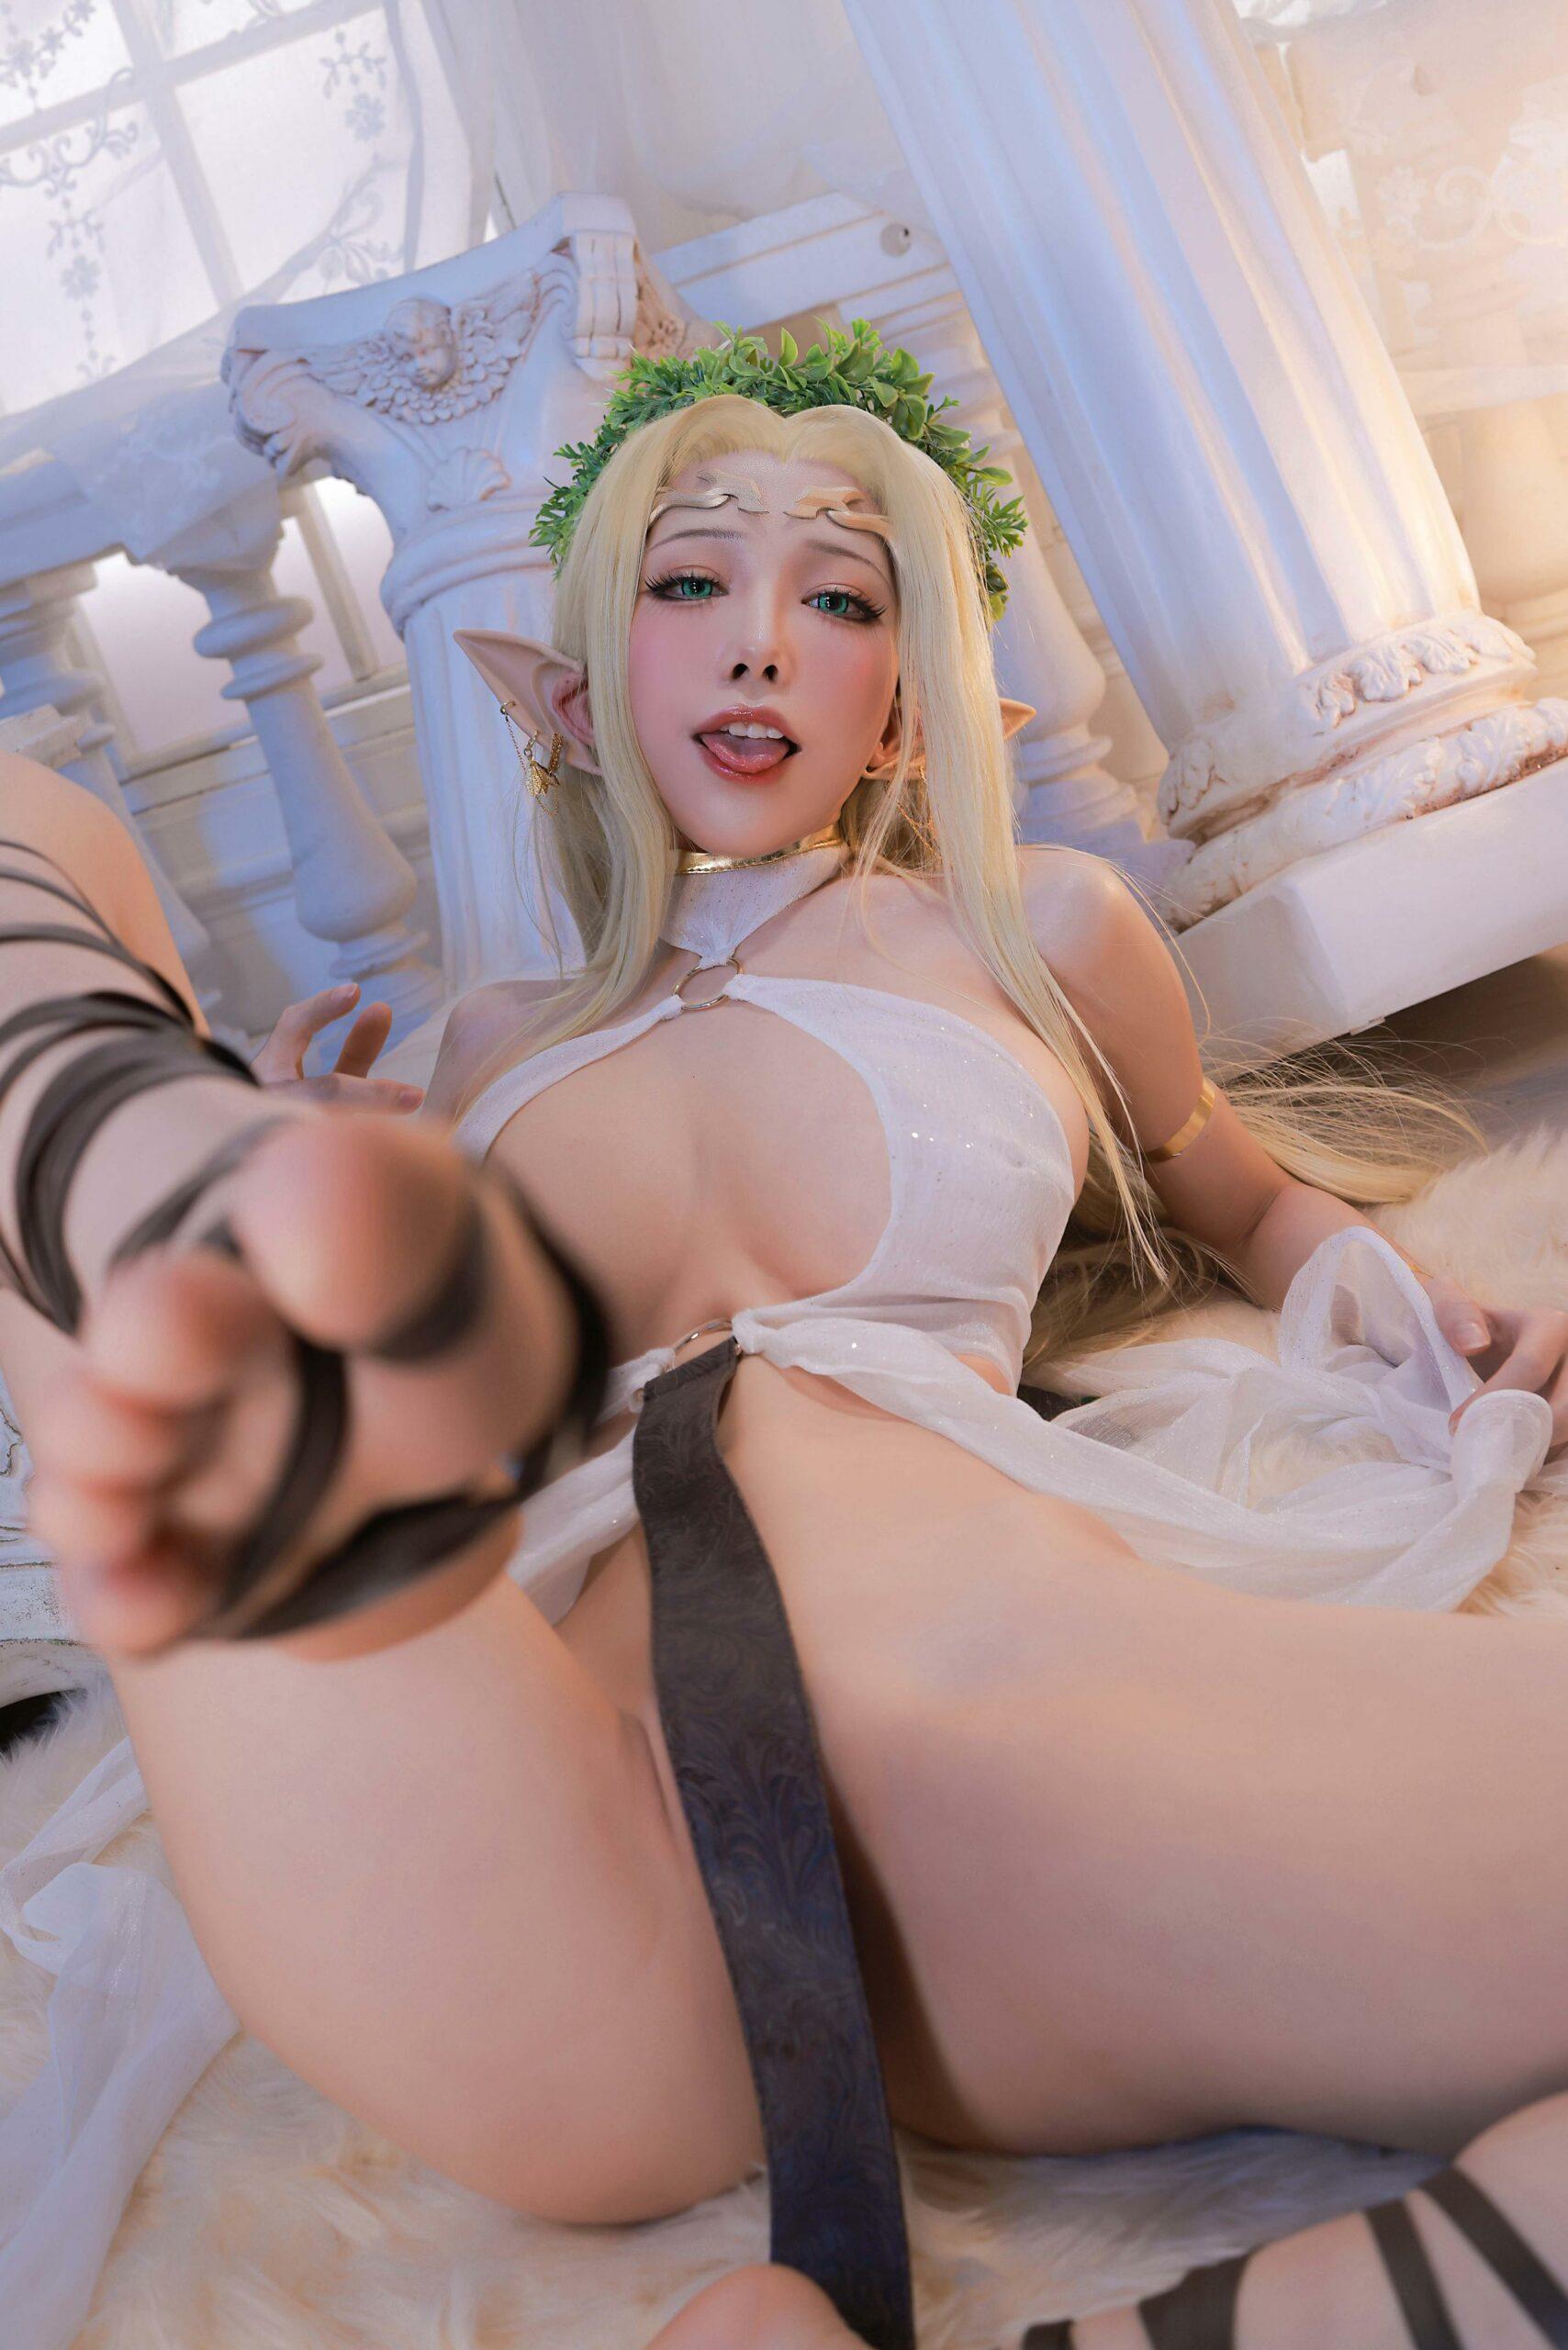 Kuroinu Celestine Cosplay by Aqua 54